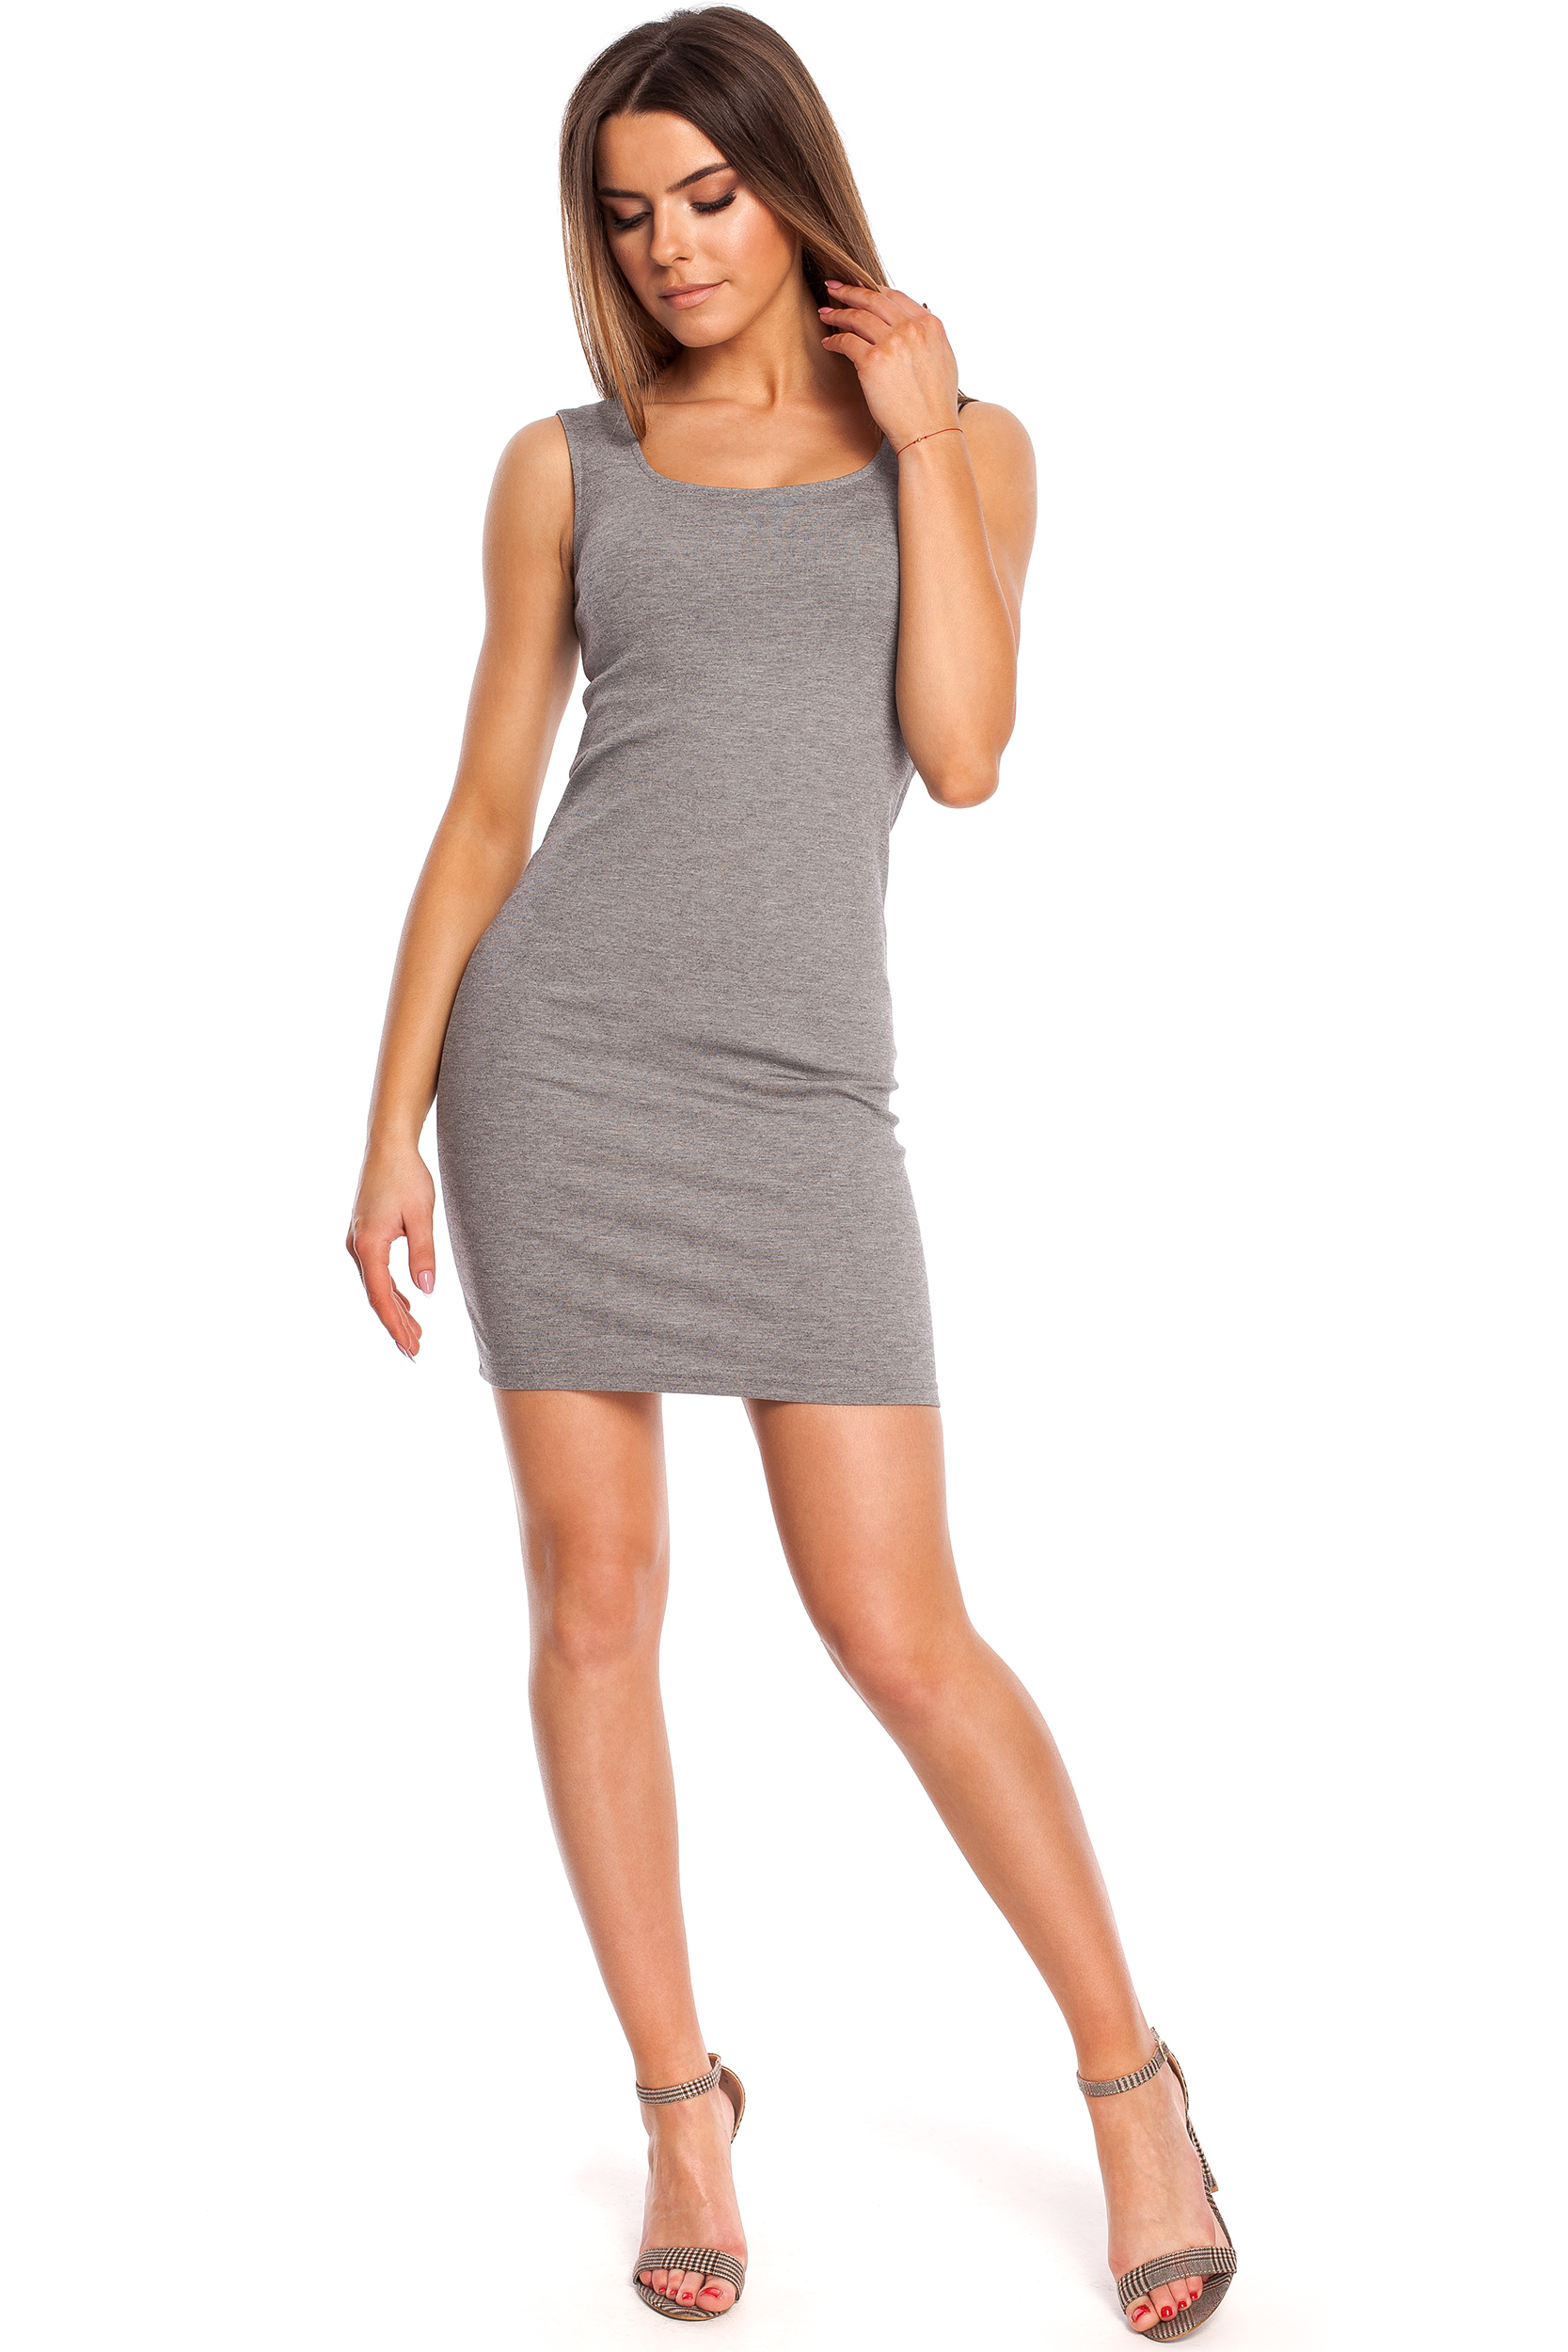 CM4320 Dopasowana sukienka mini na ramiączkach - szara